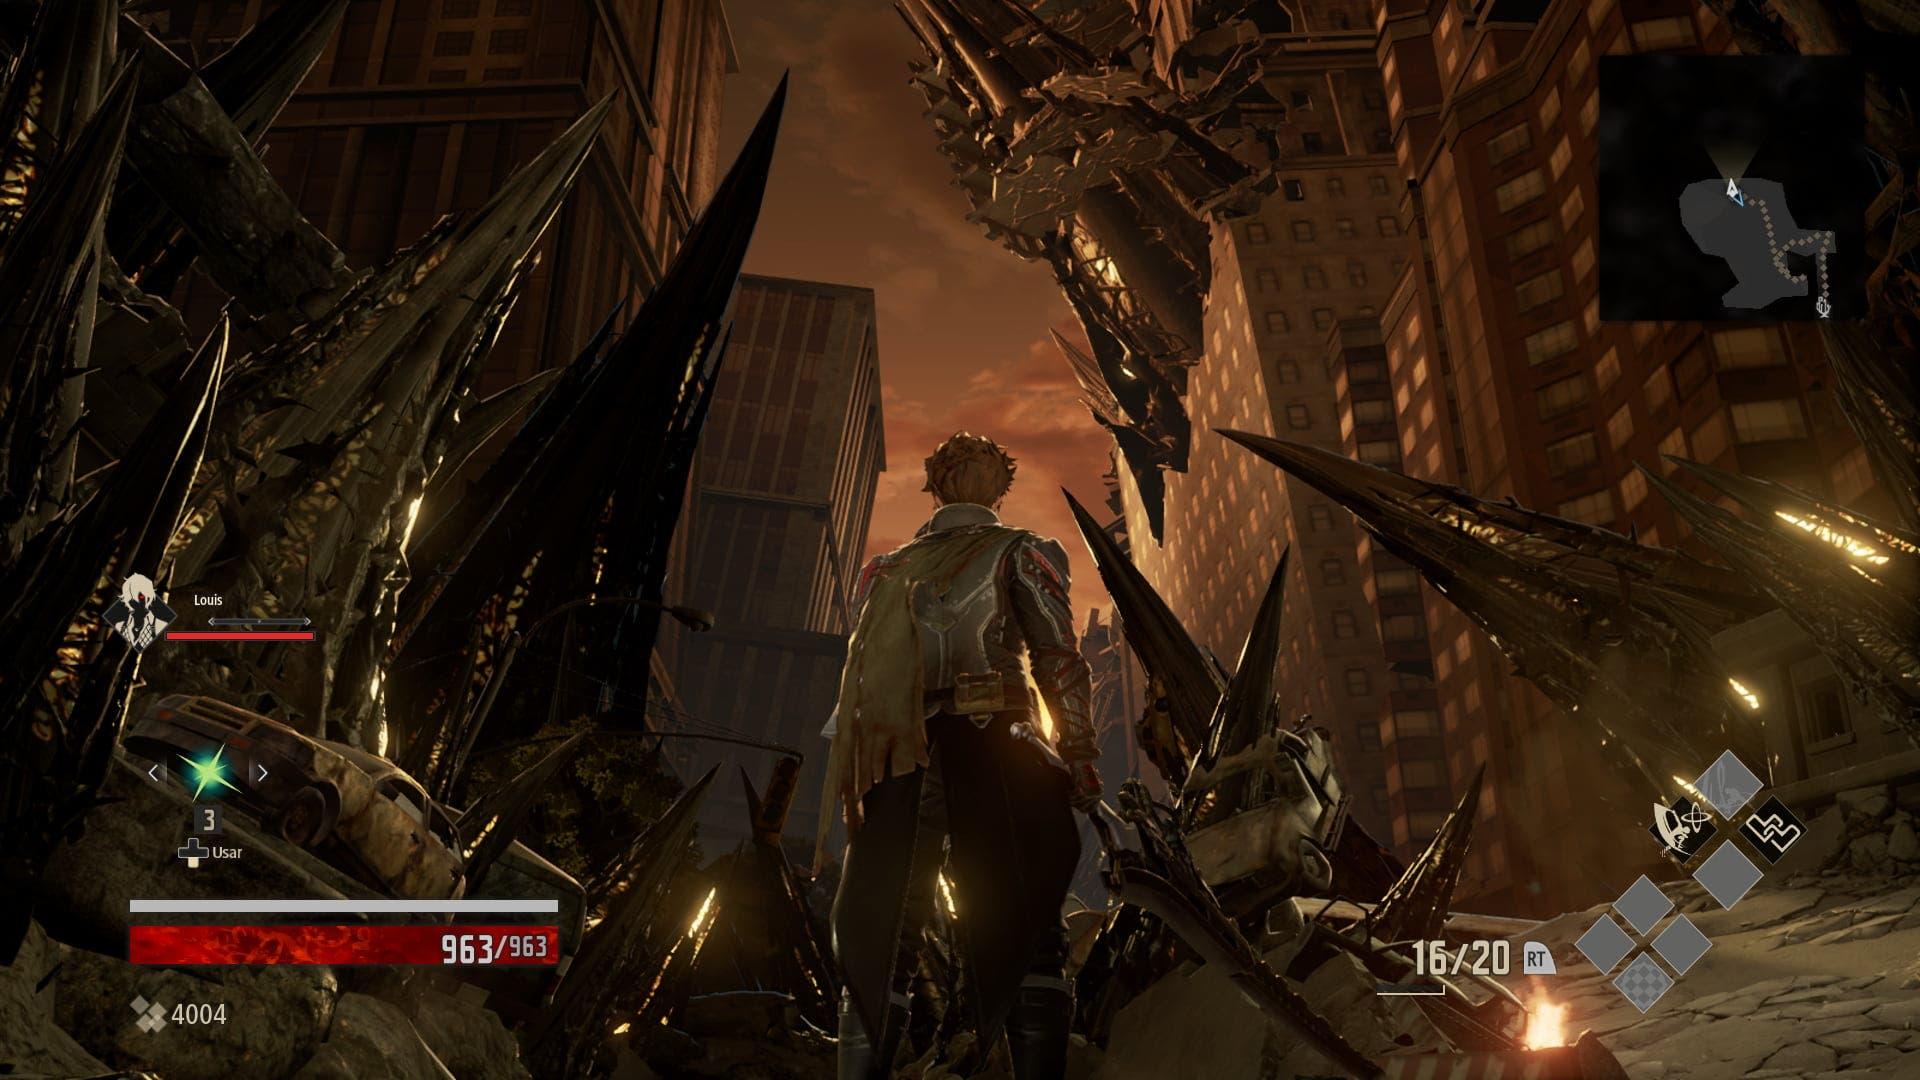 Análisis de Code Vein - Xbox One 1